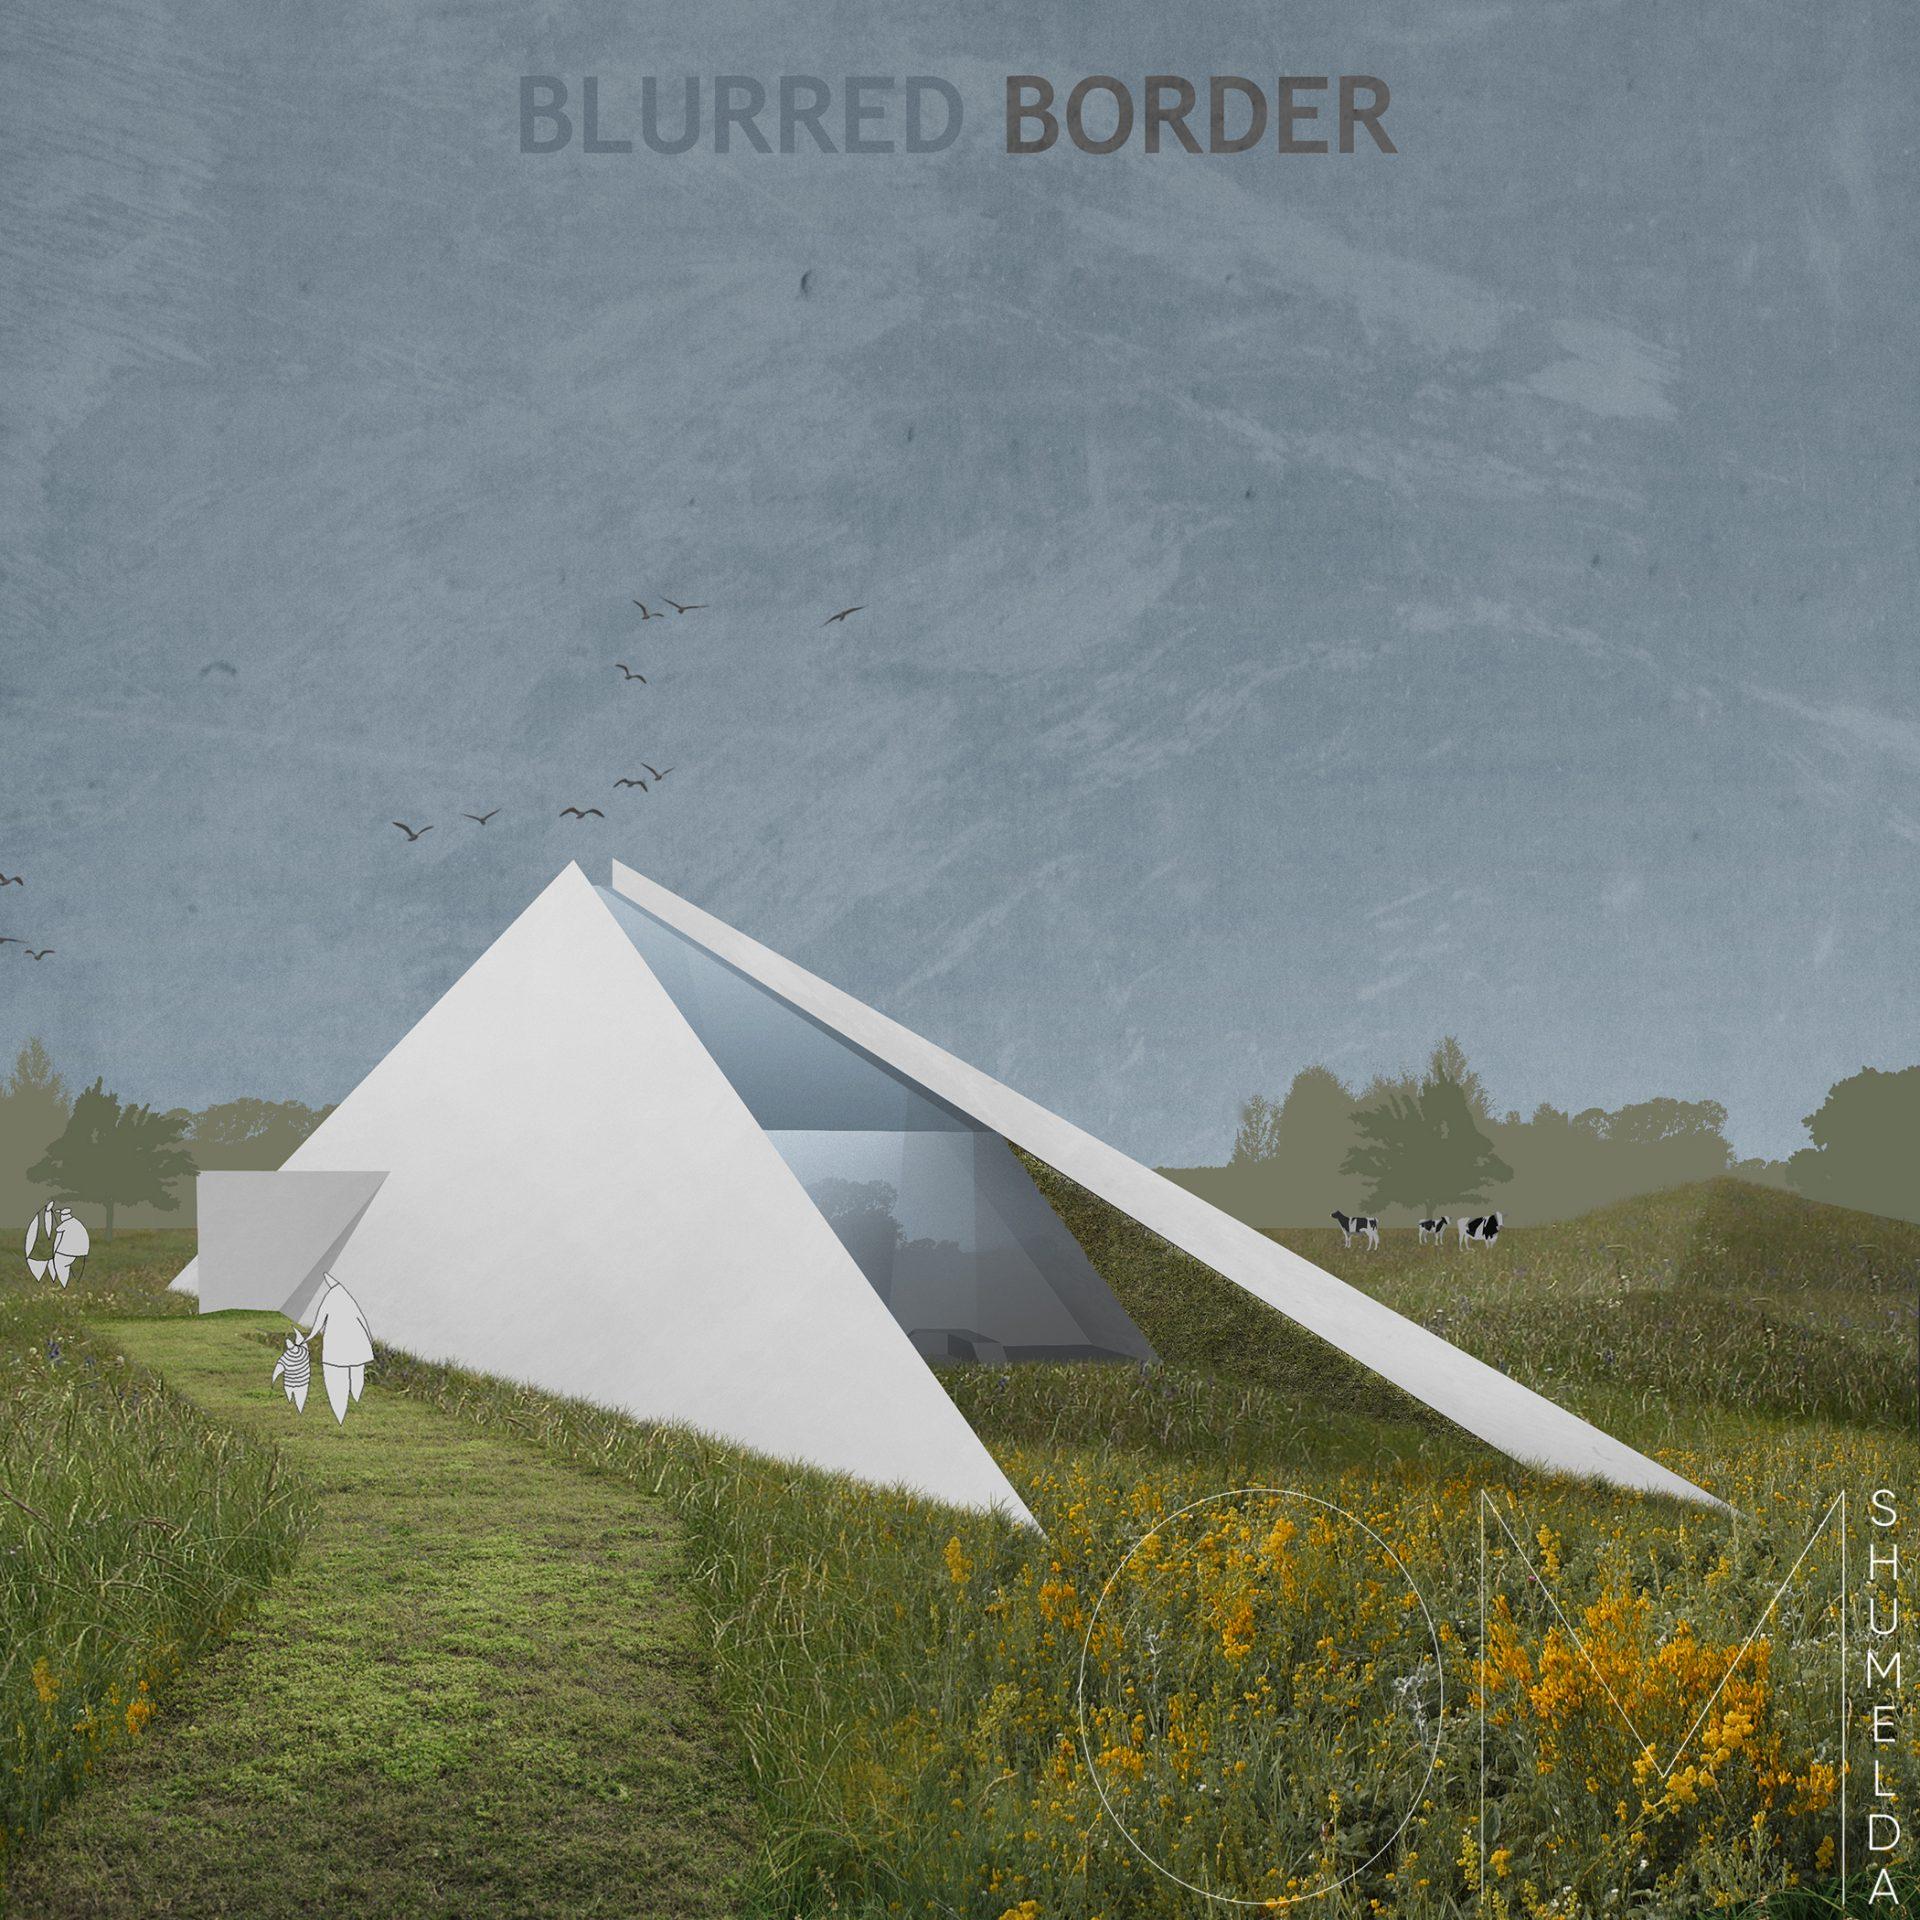 BLURRED BORDER